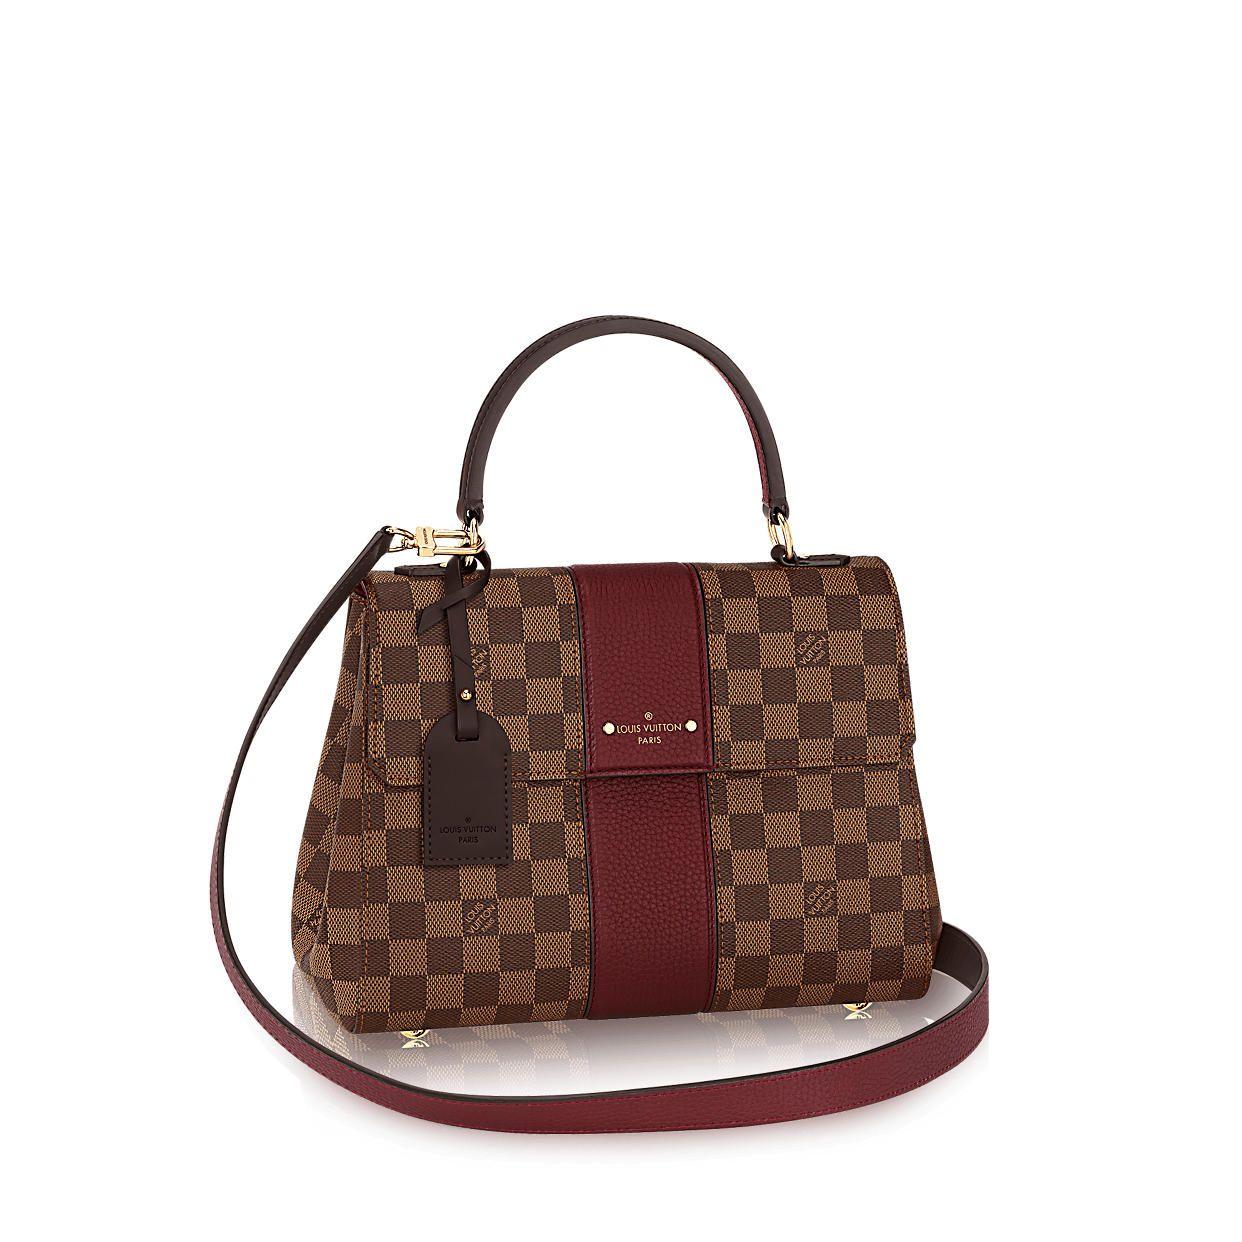 c976719d1c40 Bond Street Damier Ebene in Women s Handbags collections by Louis Vuitton